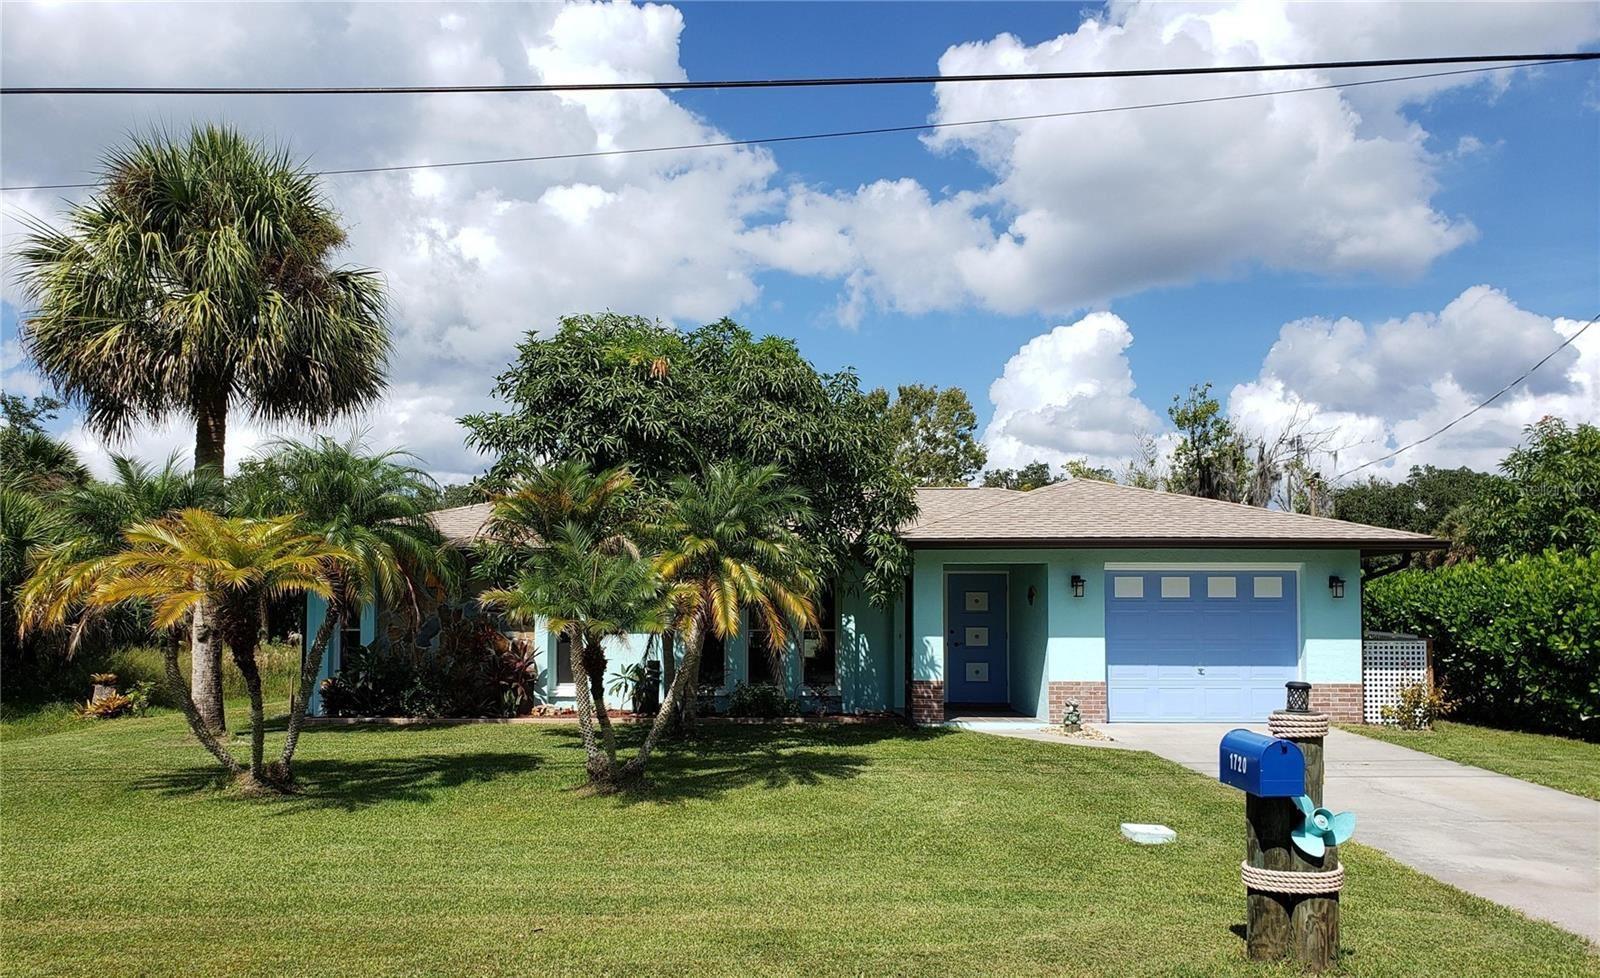 Photo of 1720 SHELL DRIVE, ENGLEWOOD, FL 34223 (MLS # U8139212)